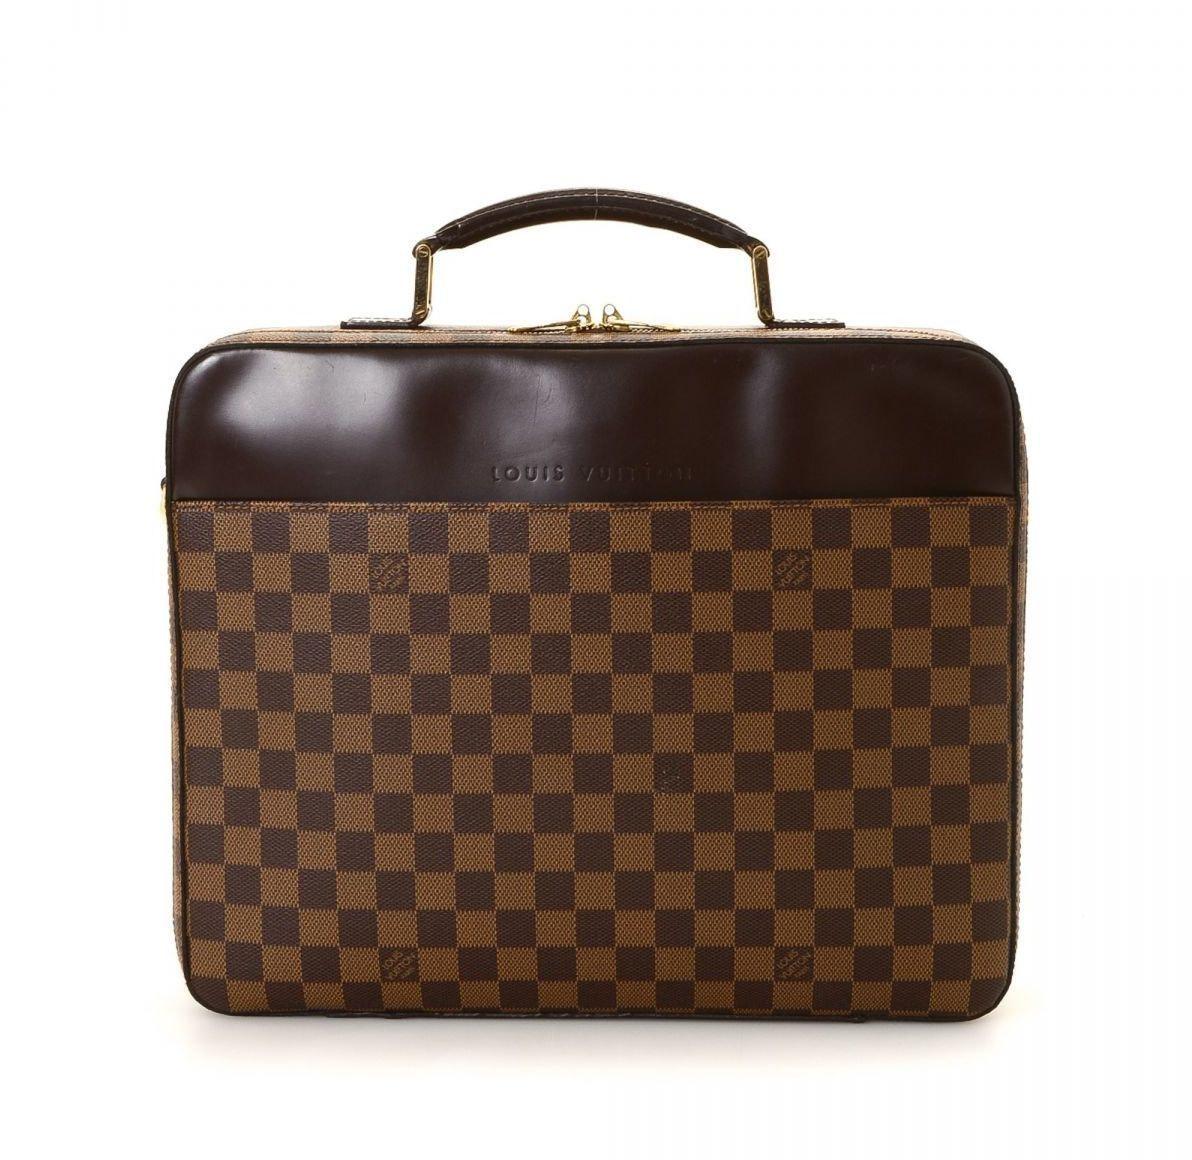 Louis Vuitton Sabana Laptop Case Damier Ebene Brown